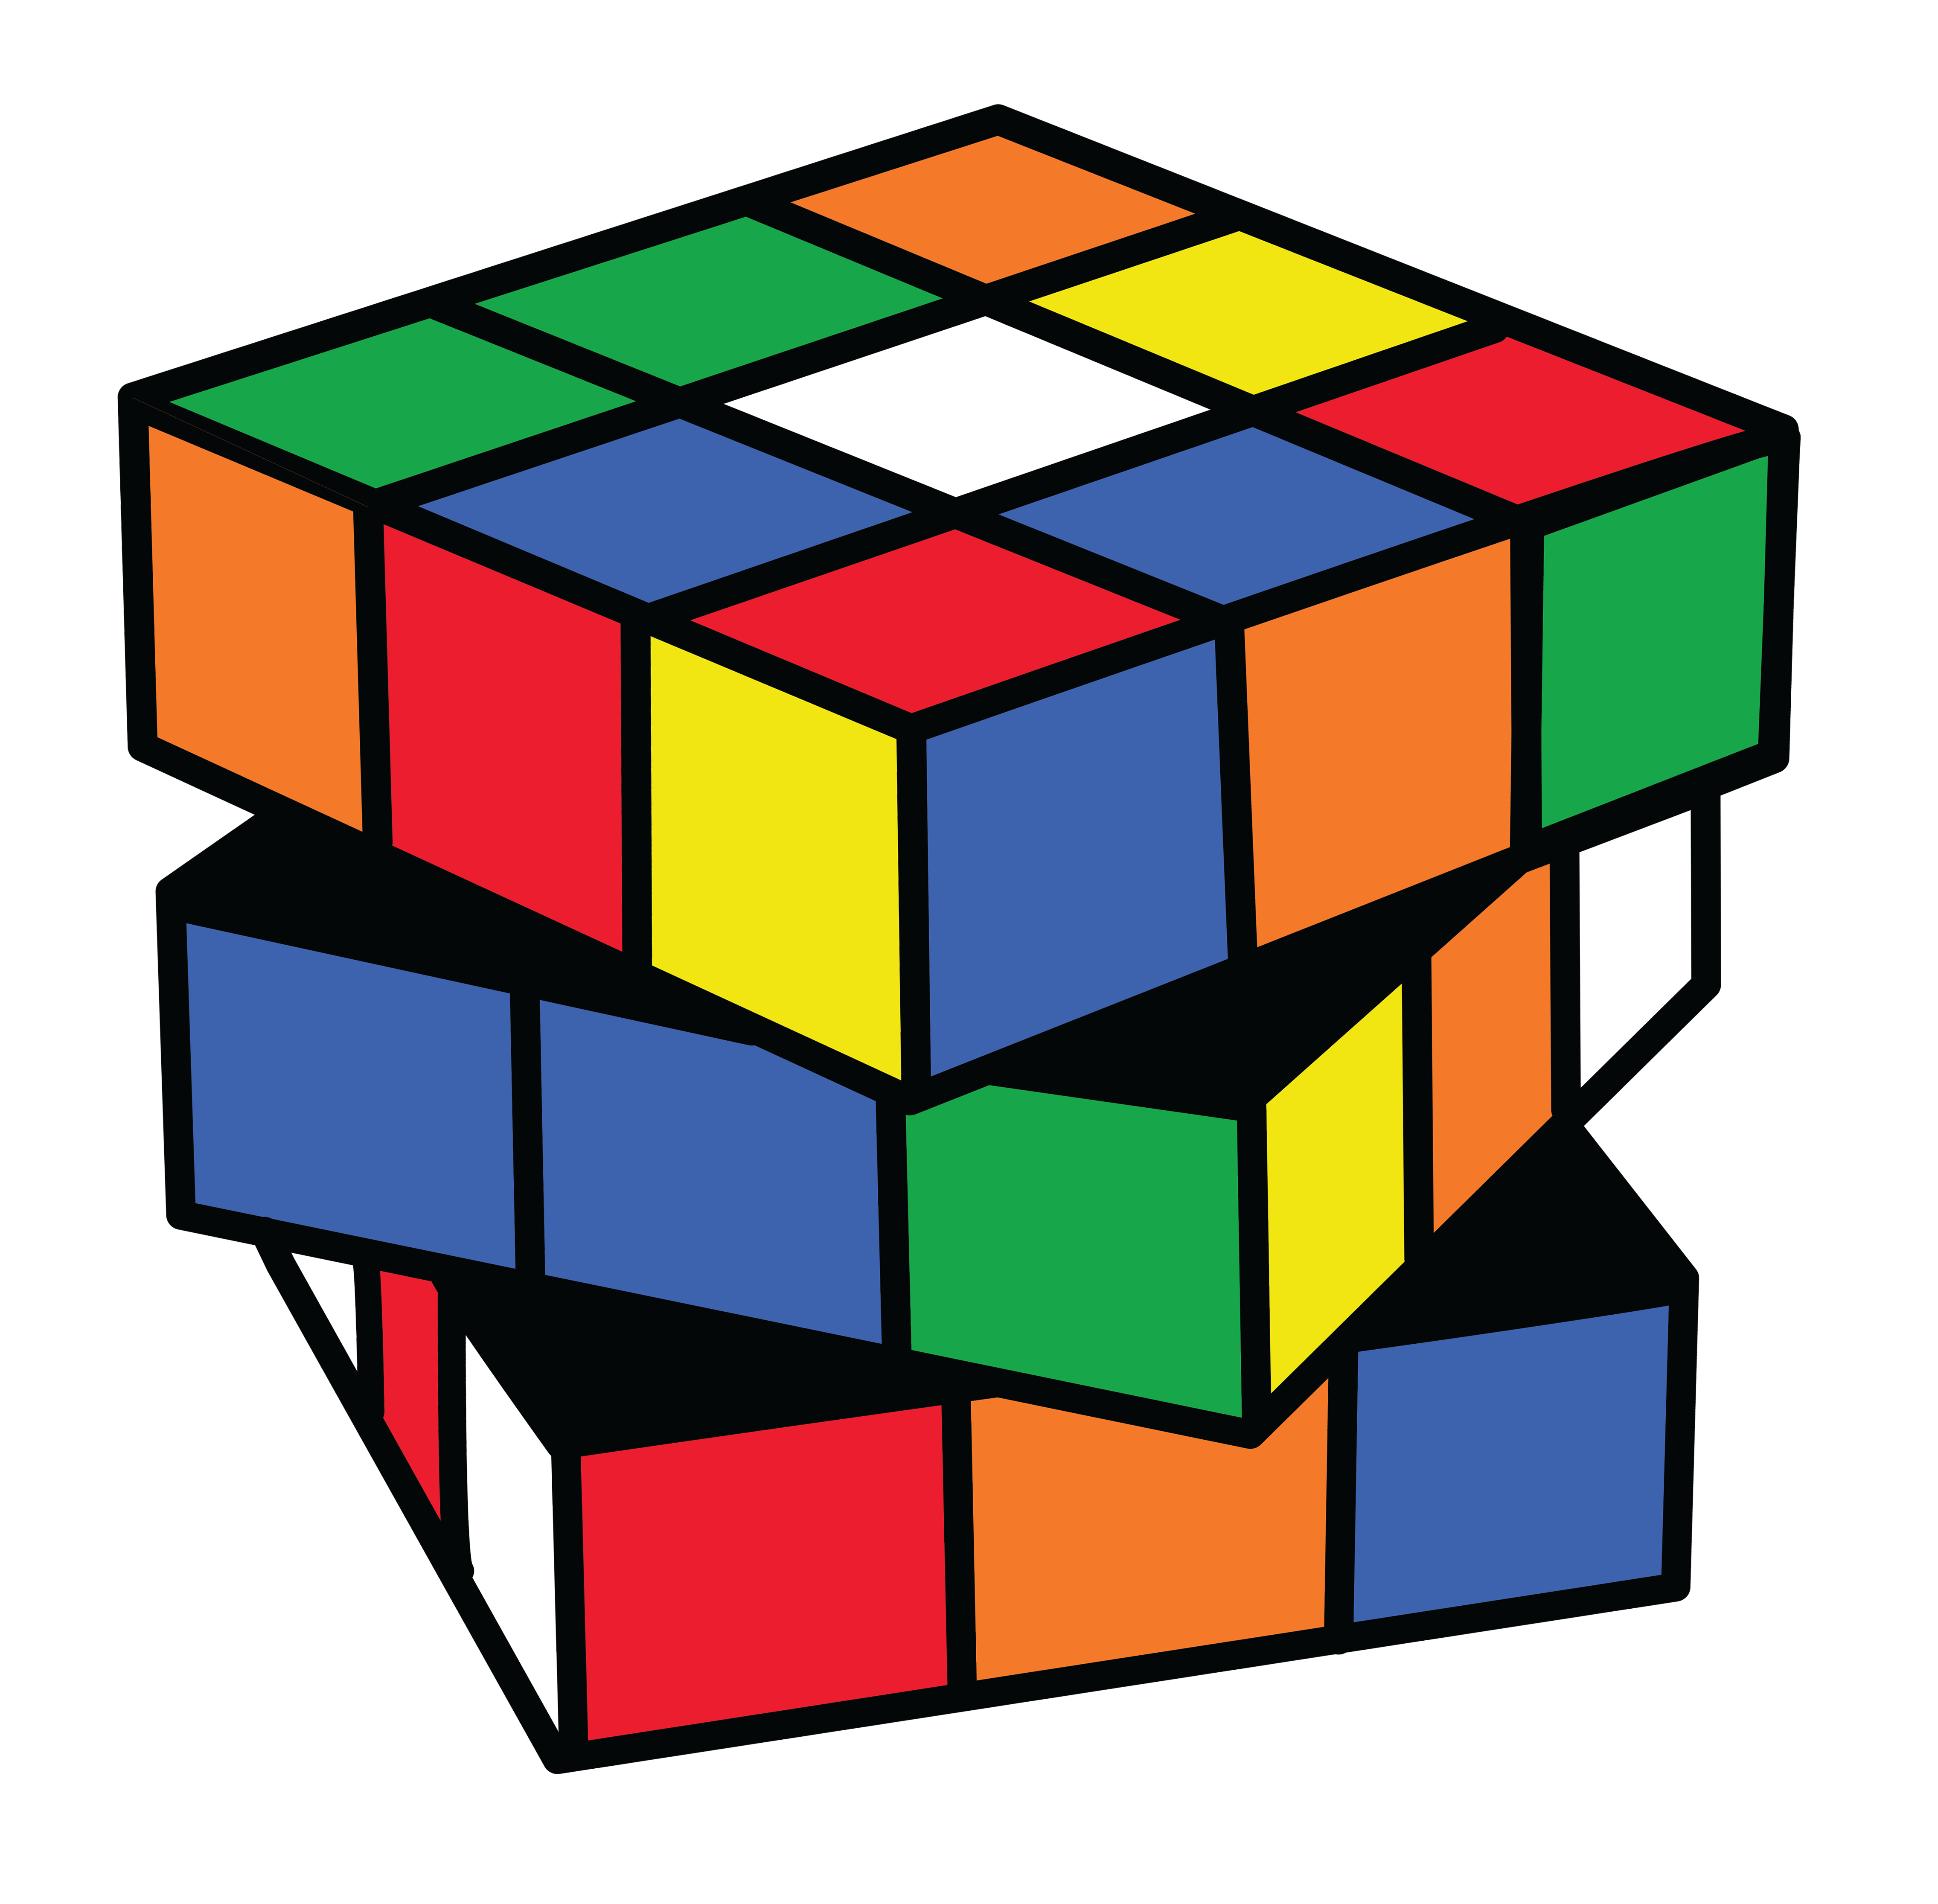 4542x4462 Rubiks Cube Puzzle Clipart